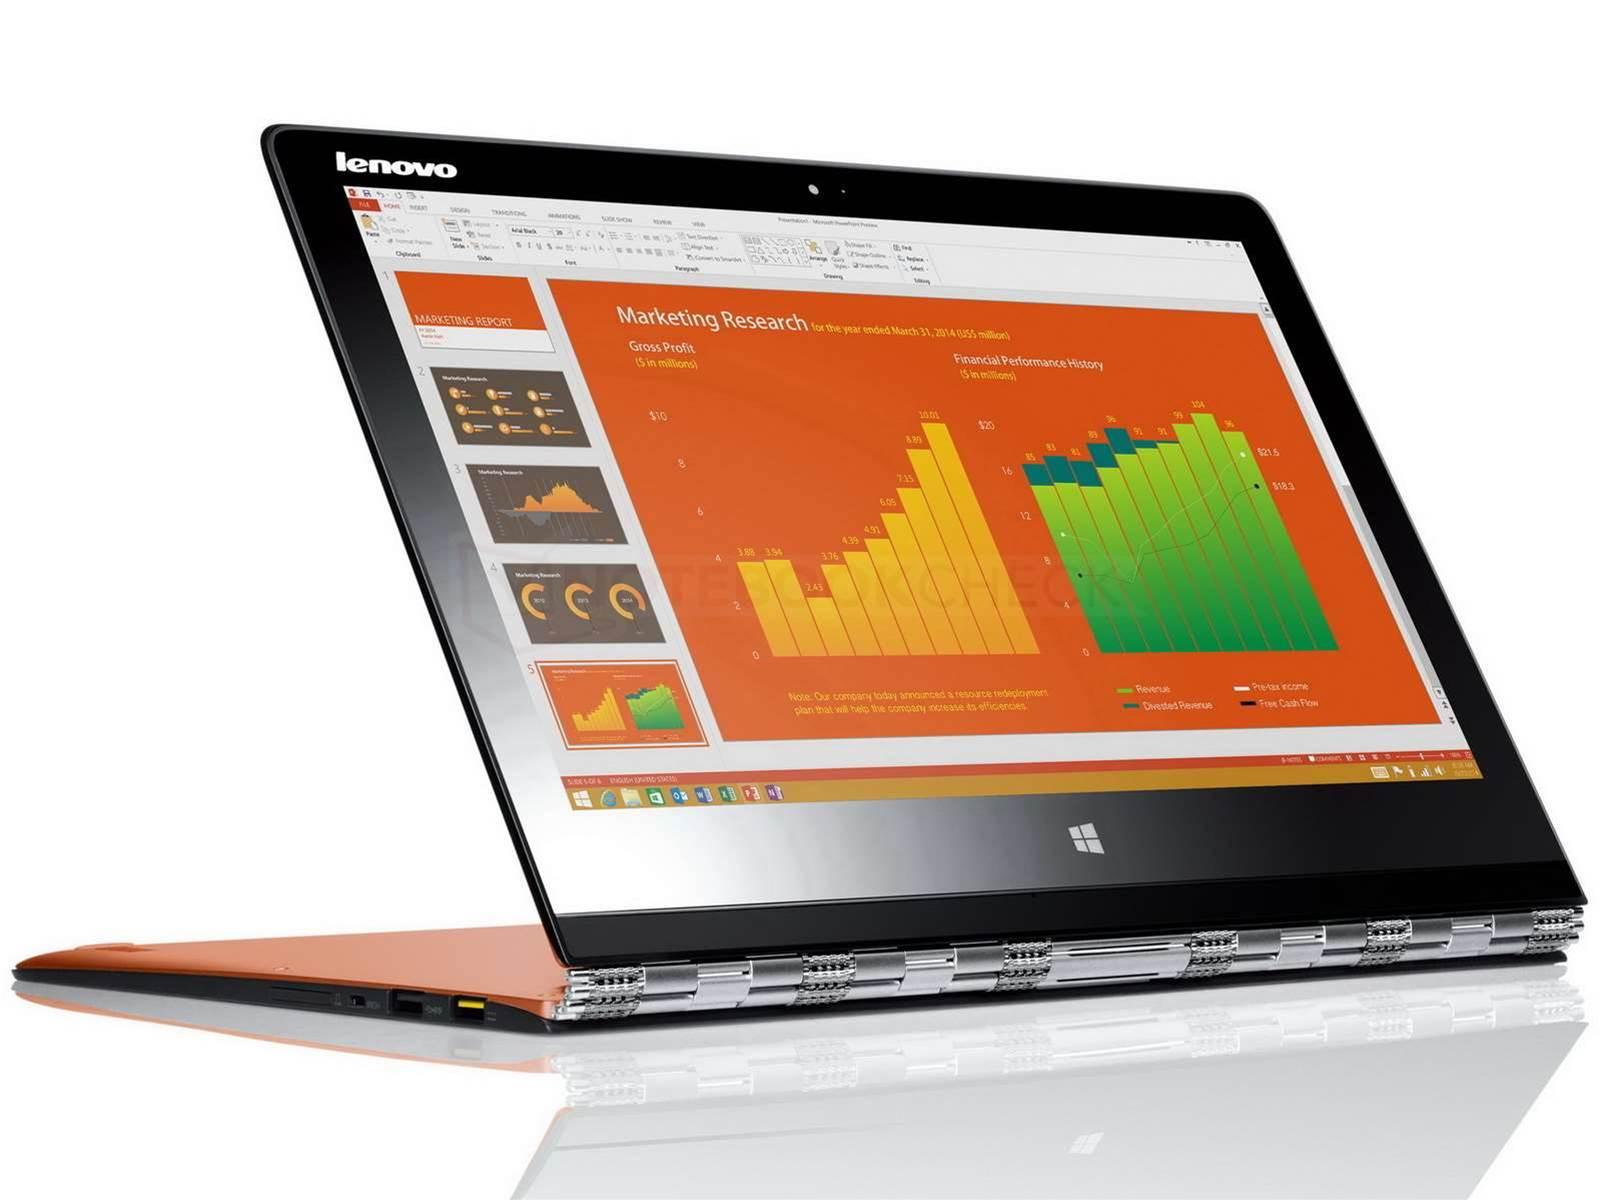 Review: Lenovo Yoga 3 Pro